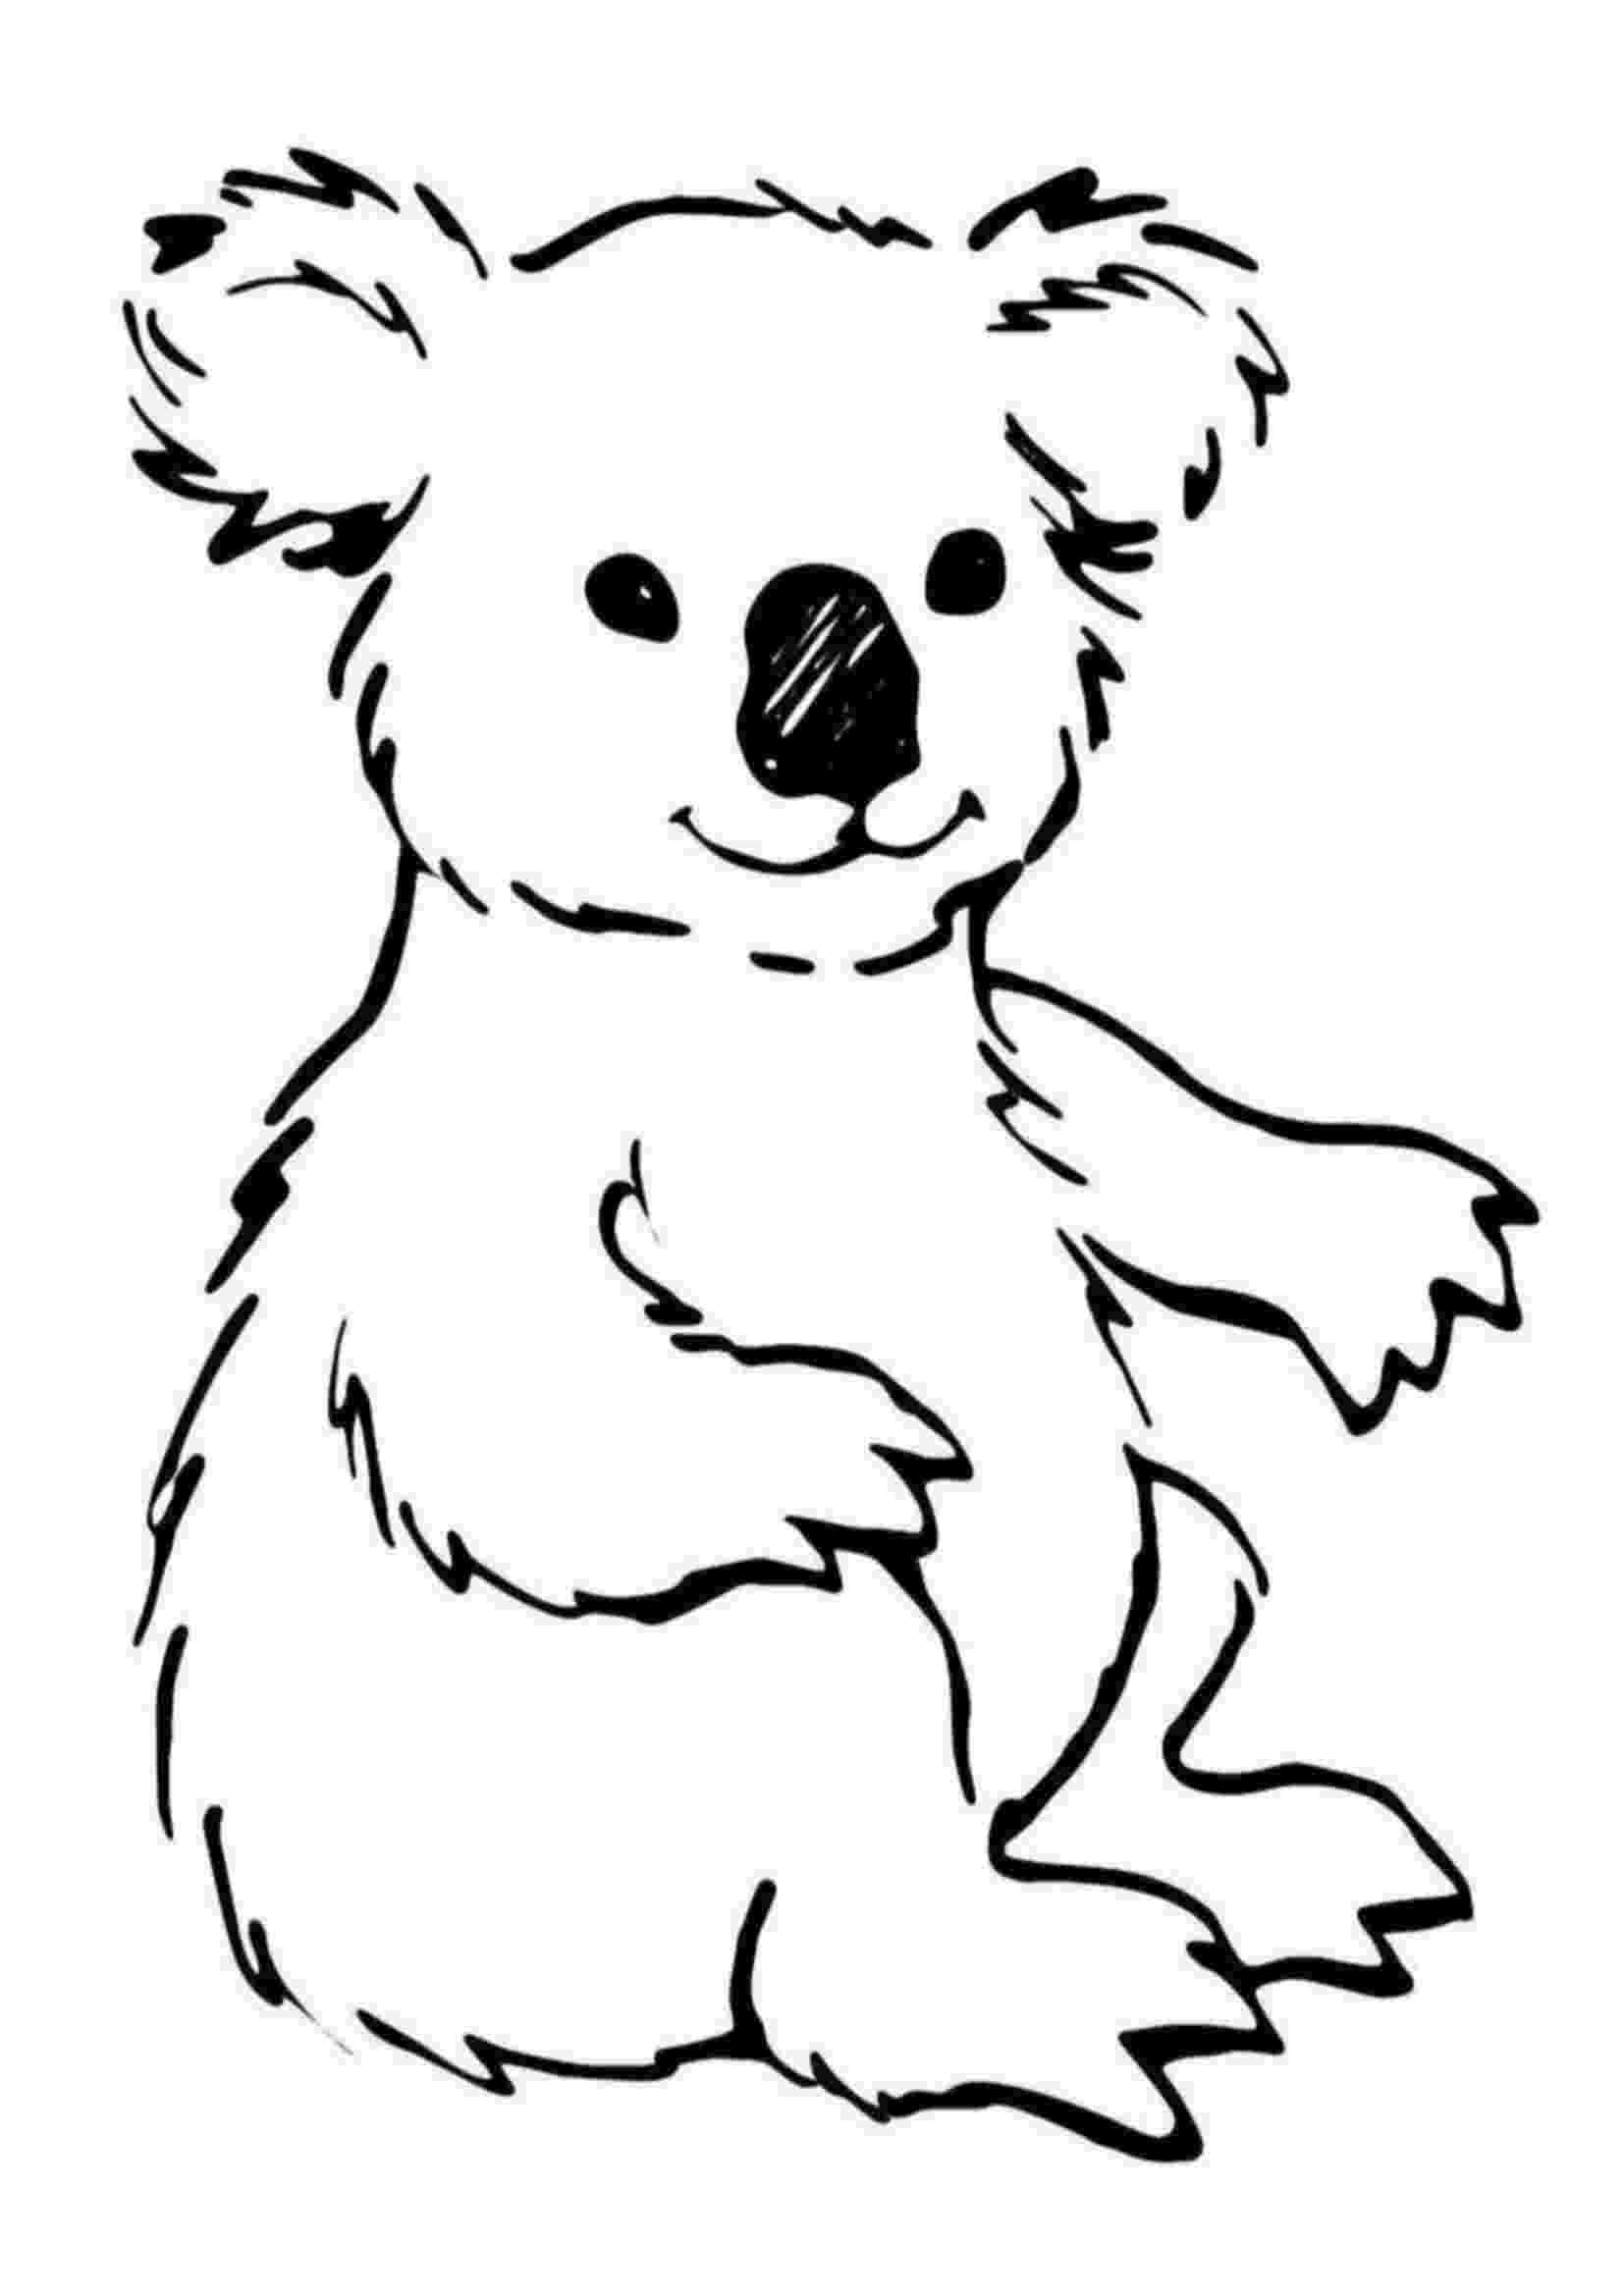 koala coloring pages koala coloring page super simple coloring koala pages